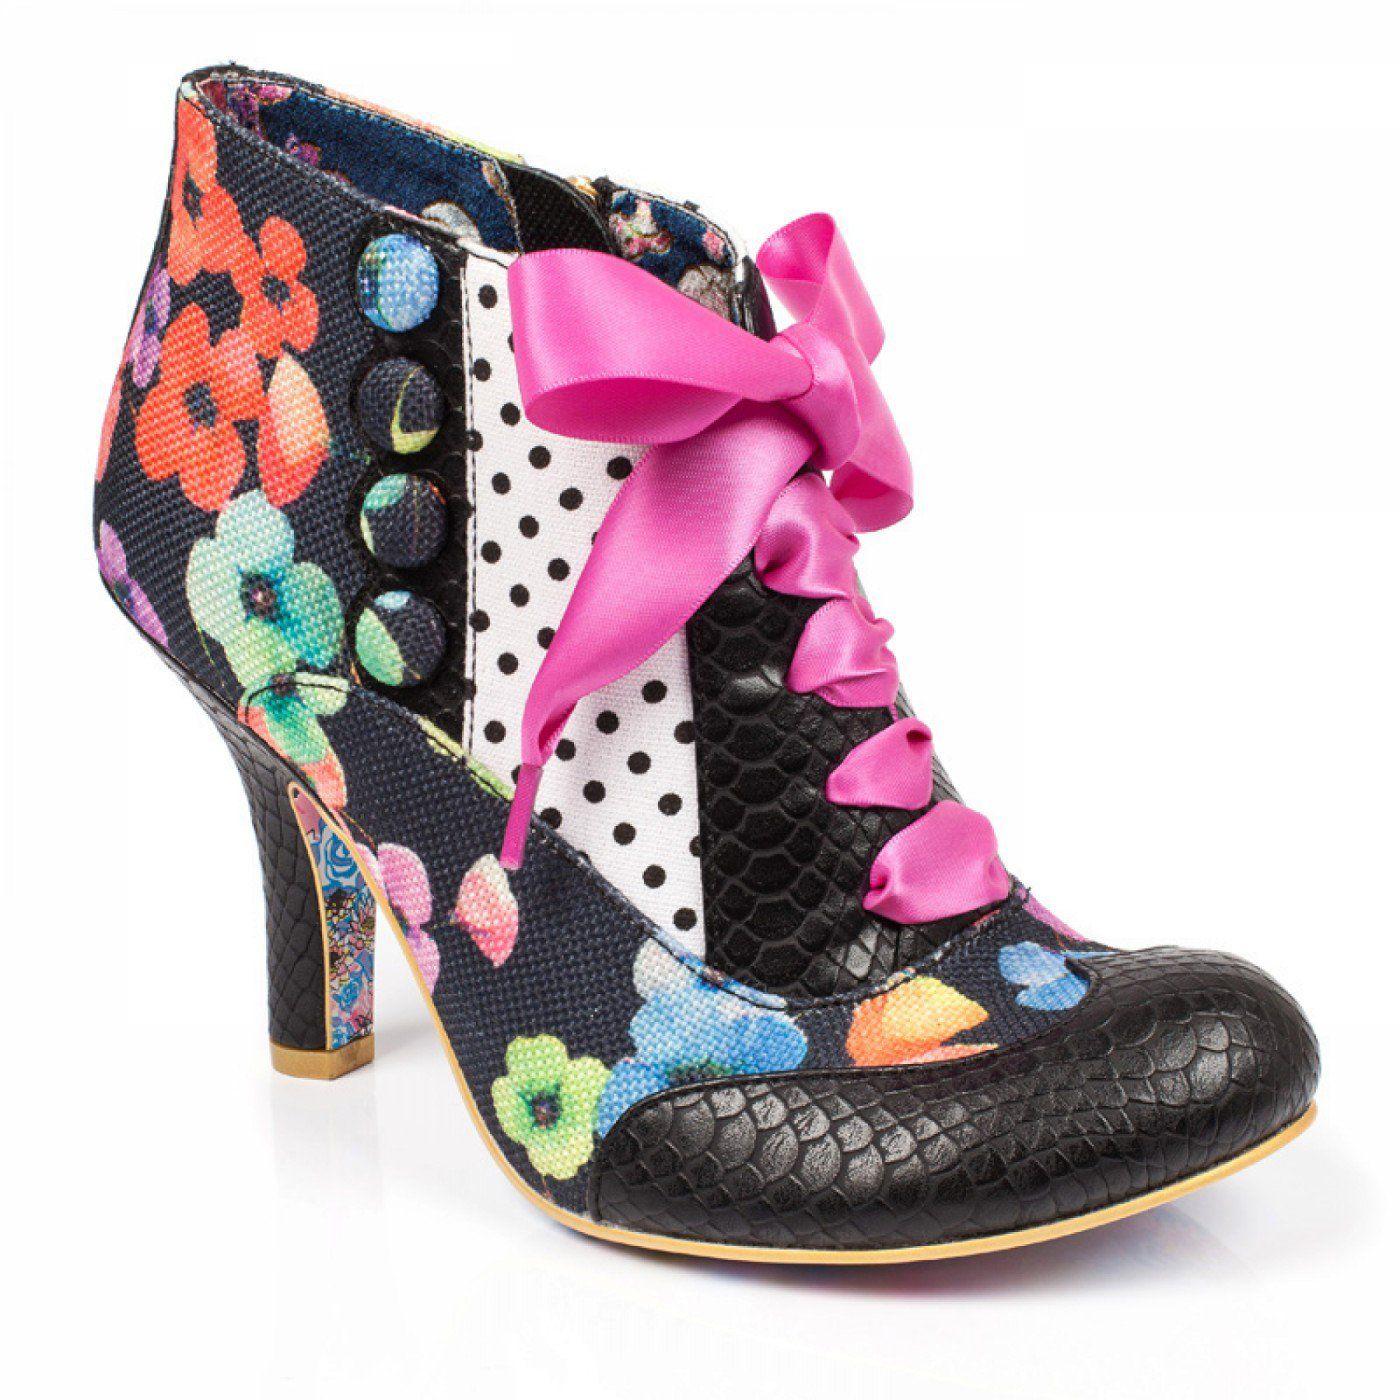 Elfglow Irregular Pinterest Choice Blair Shoes RfwdWq